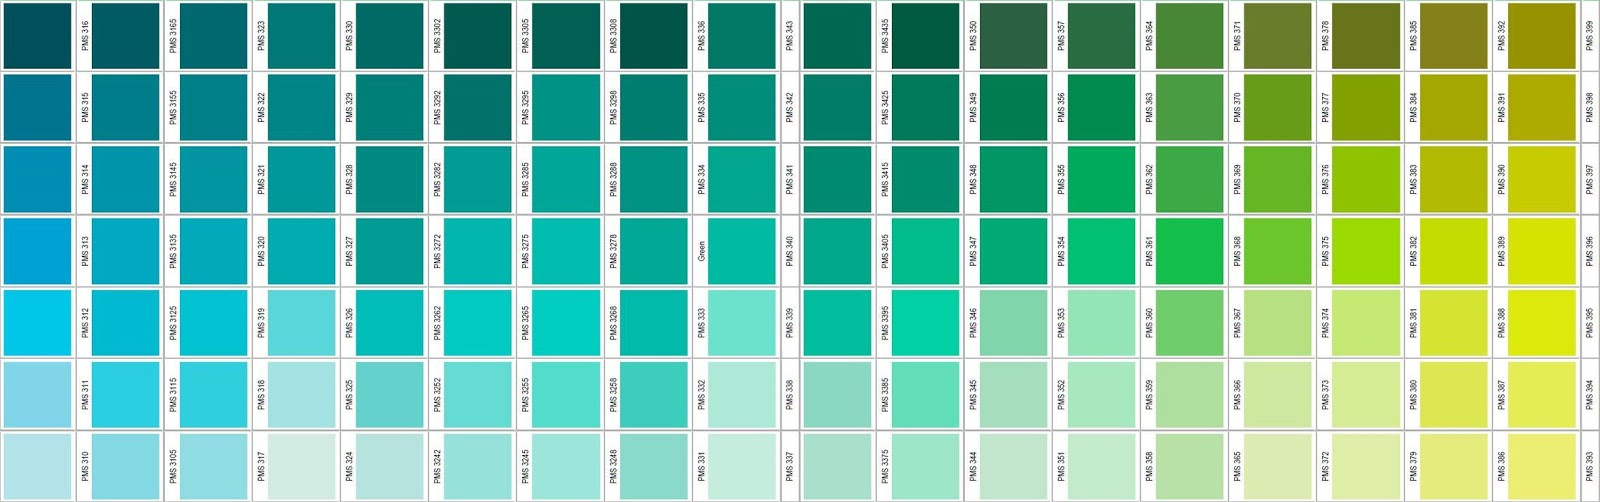 Teor a del color octubre 2017 - Gama de verdes ...